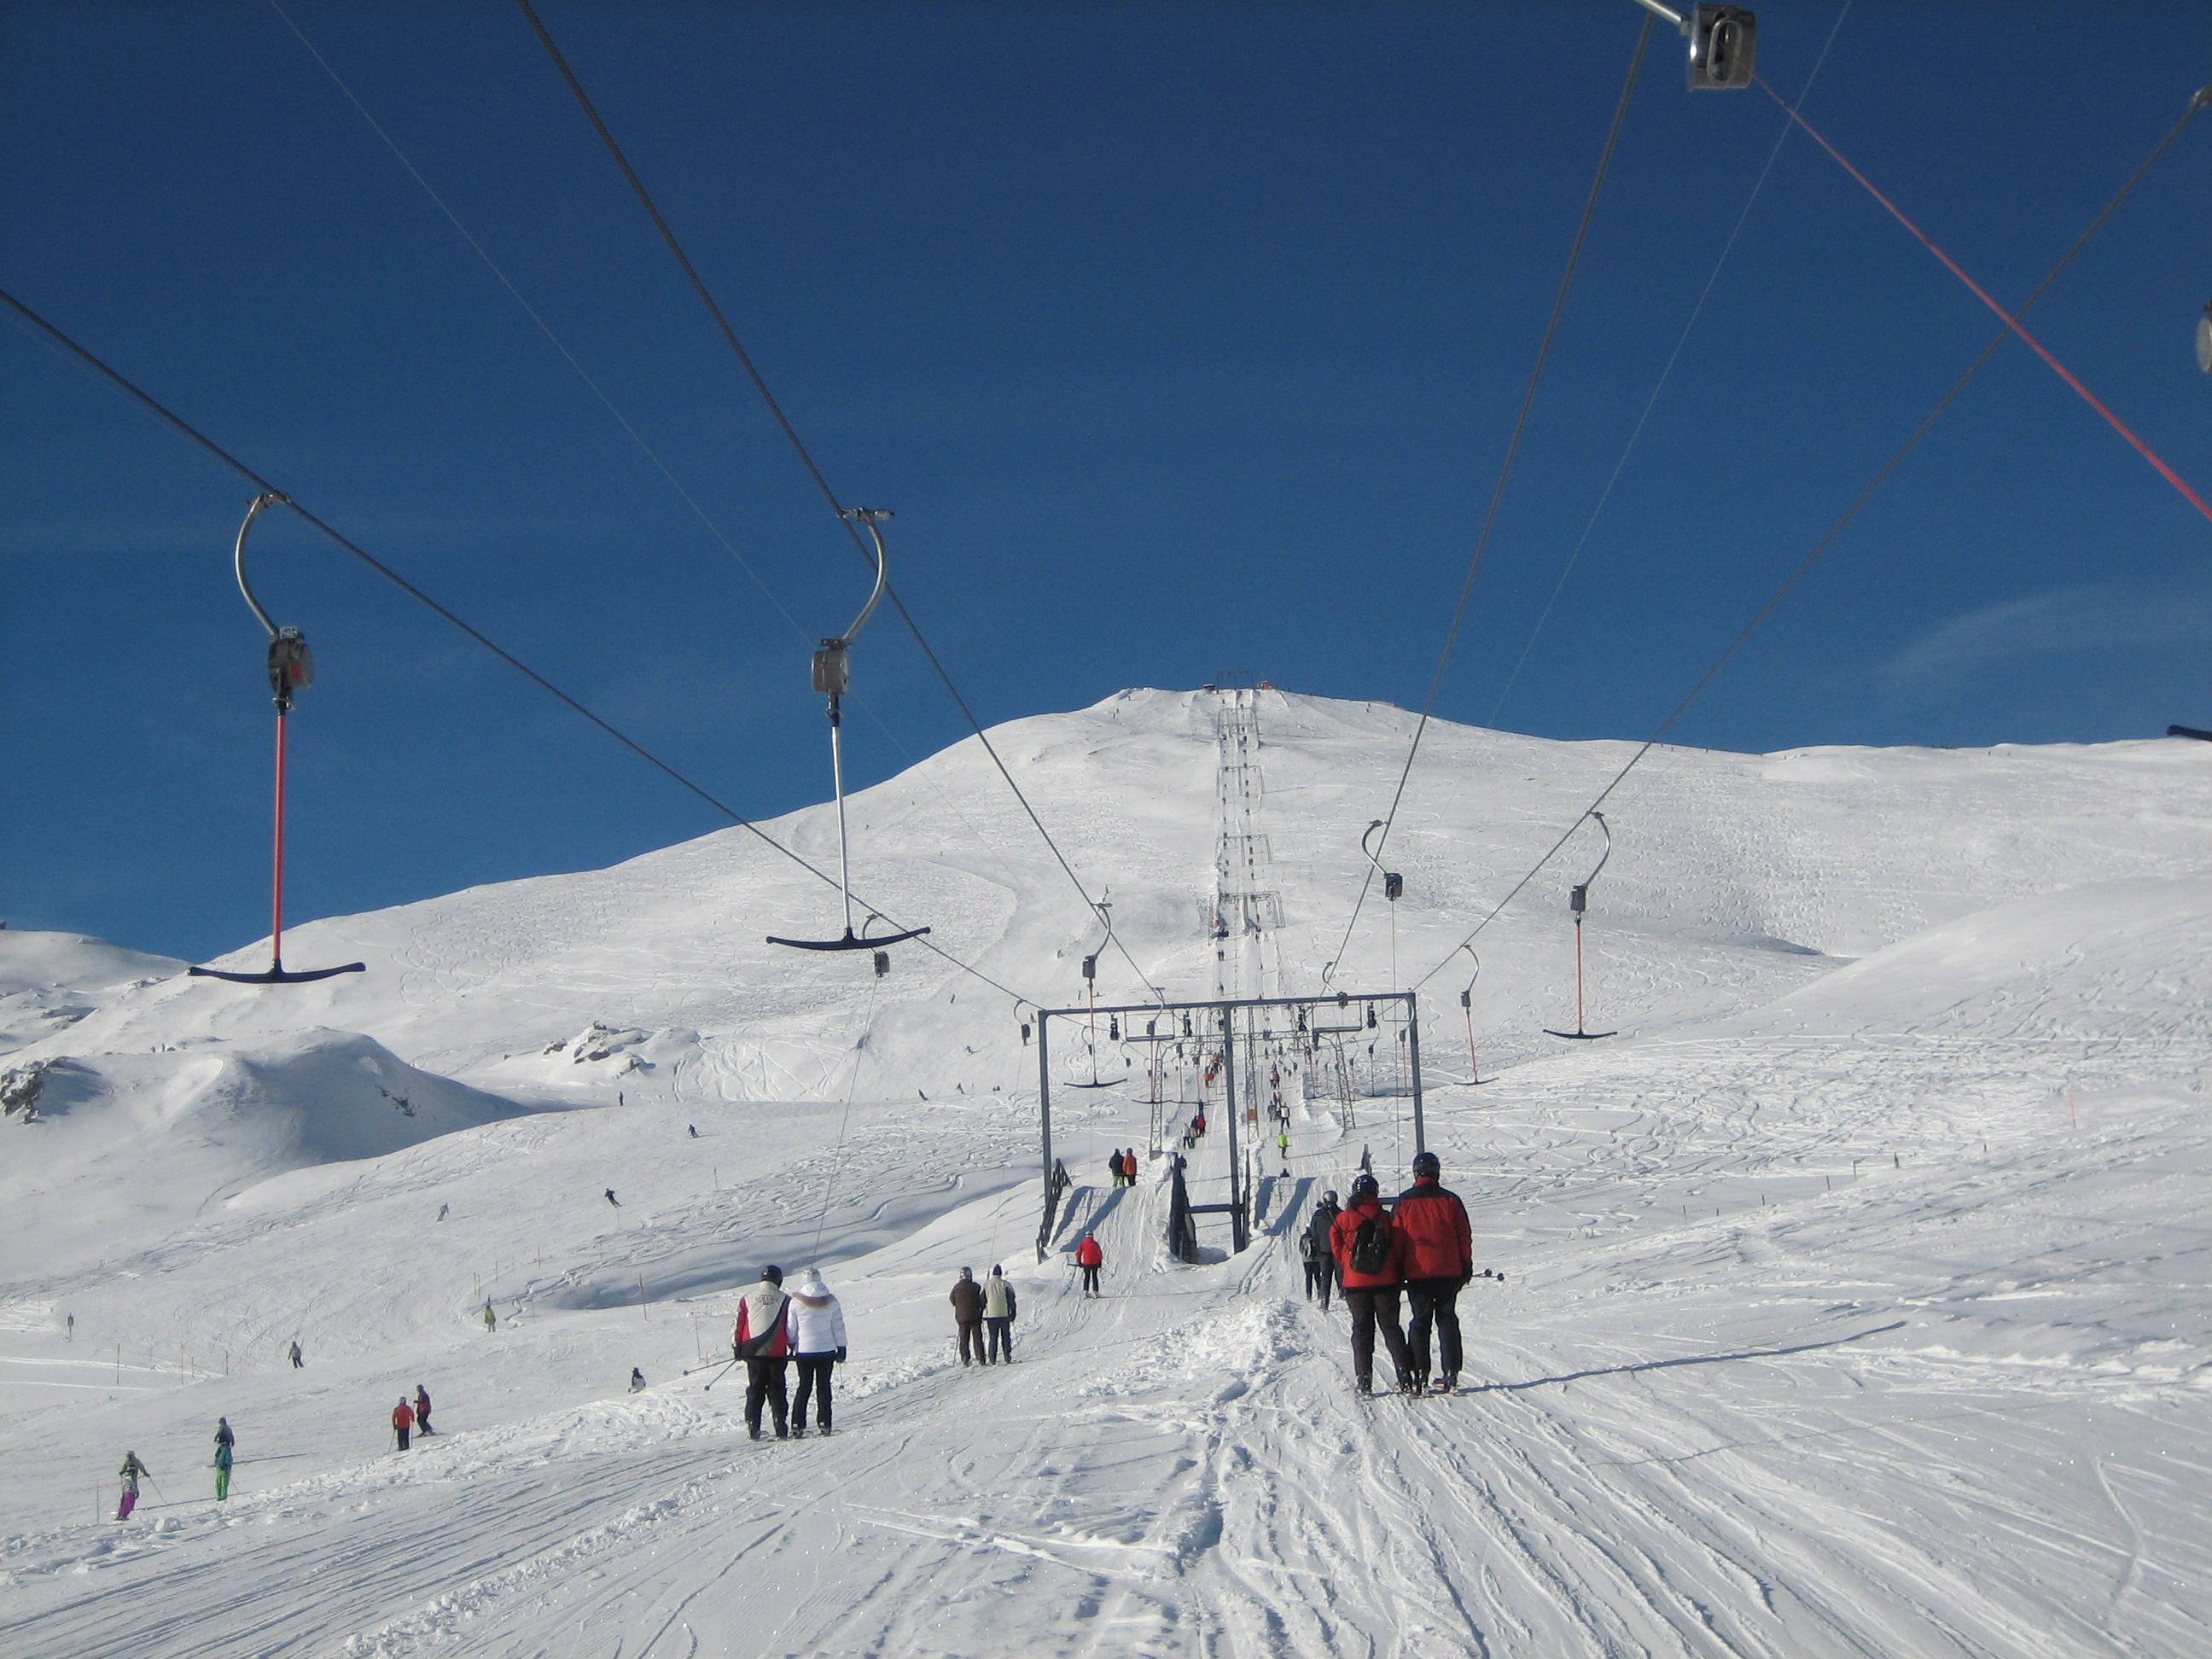 ski lift skiing snowboarding - photo #28